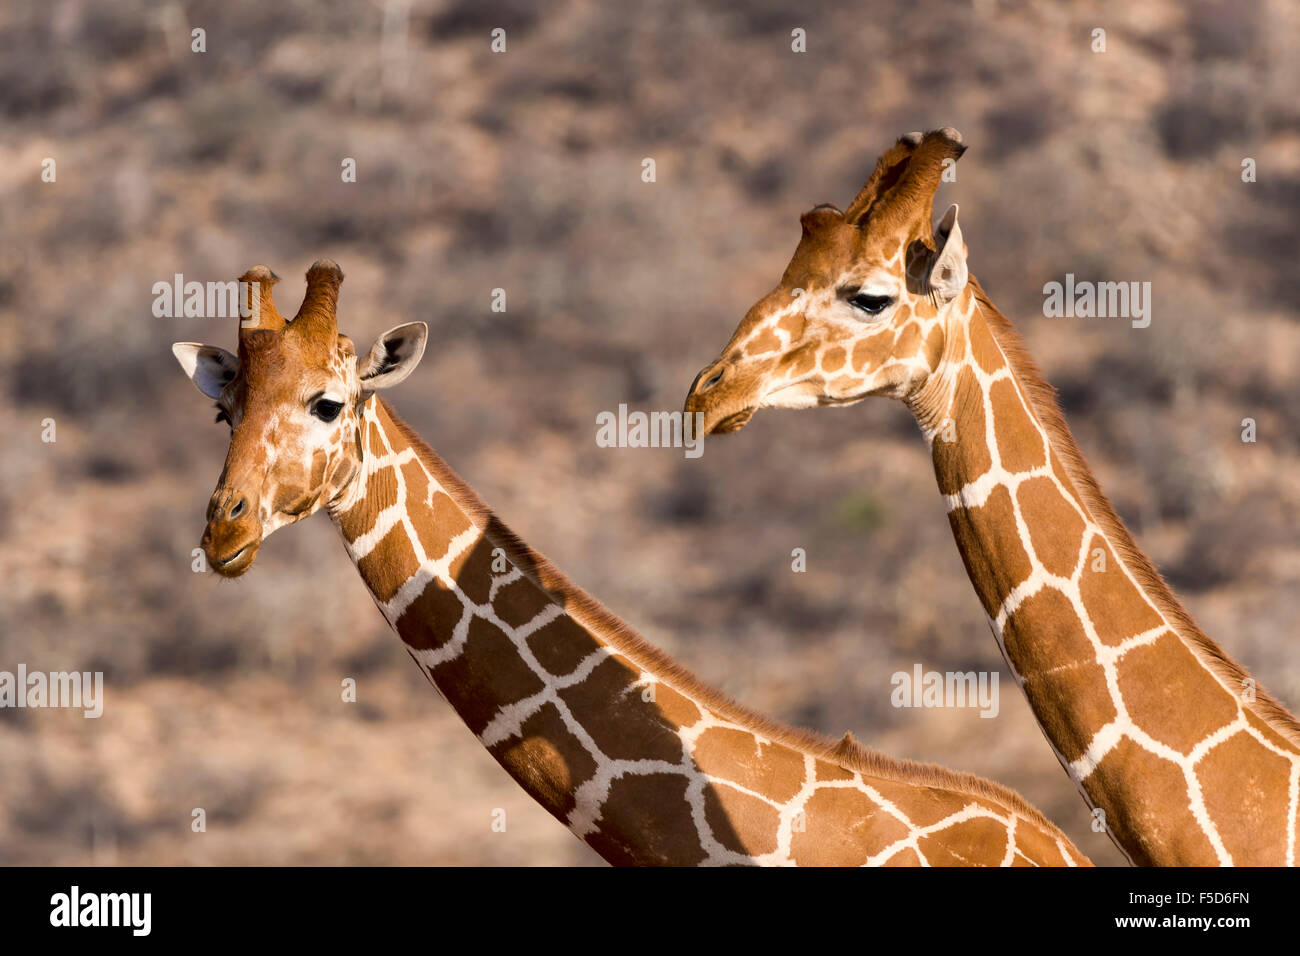 Les Girafes réticulée ou Somali girafes (Giraffa camelopardalis reticulata), Portrait, la réserve nationale de Samburu, Kenya Banque D'Images